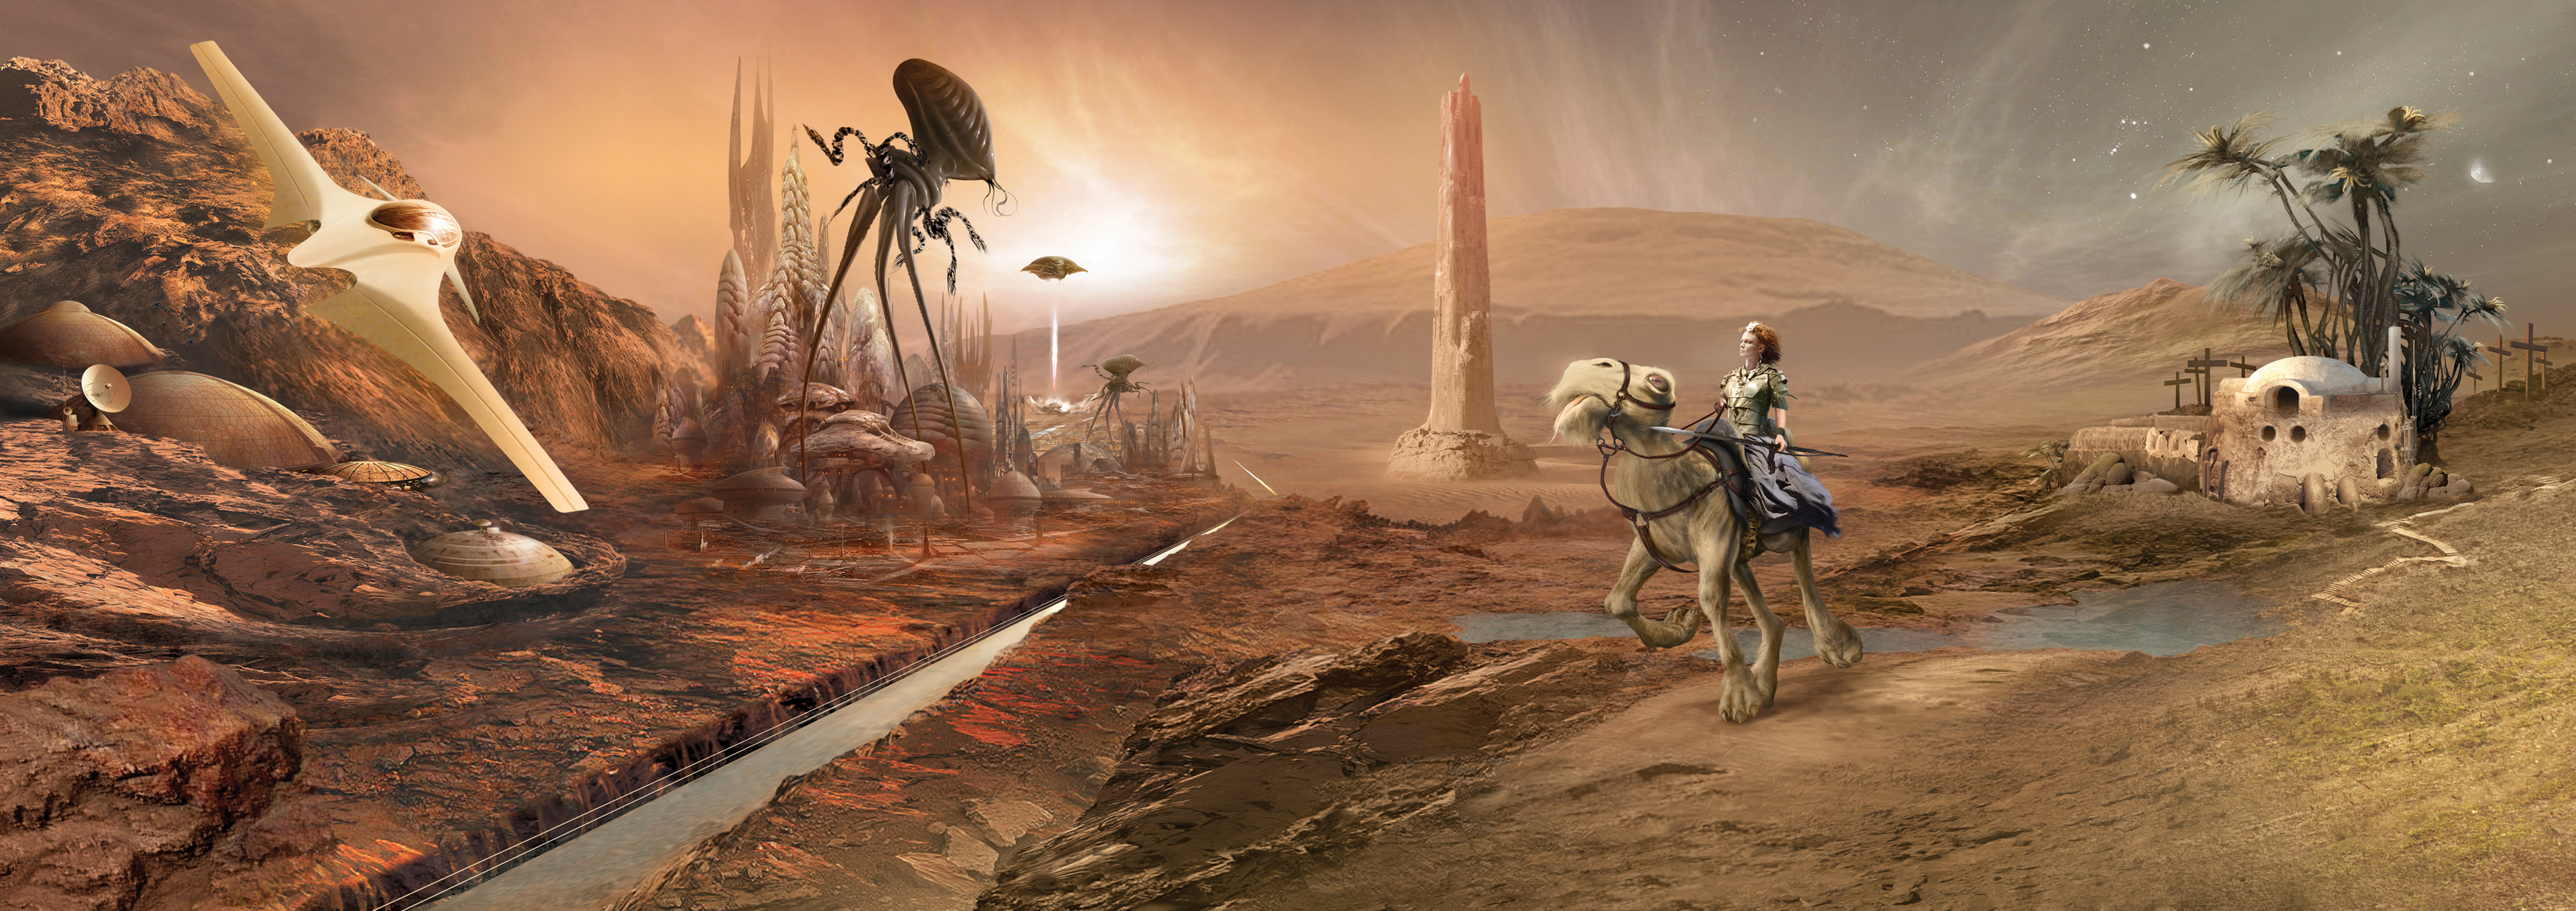 'The Martian Quartet' Artwork by Jim Burns